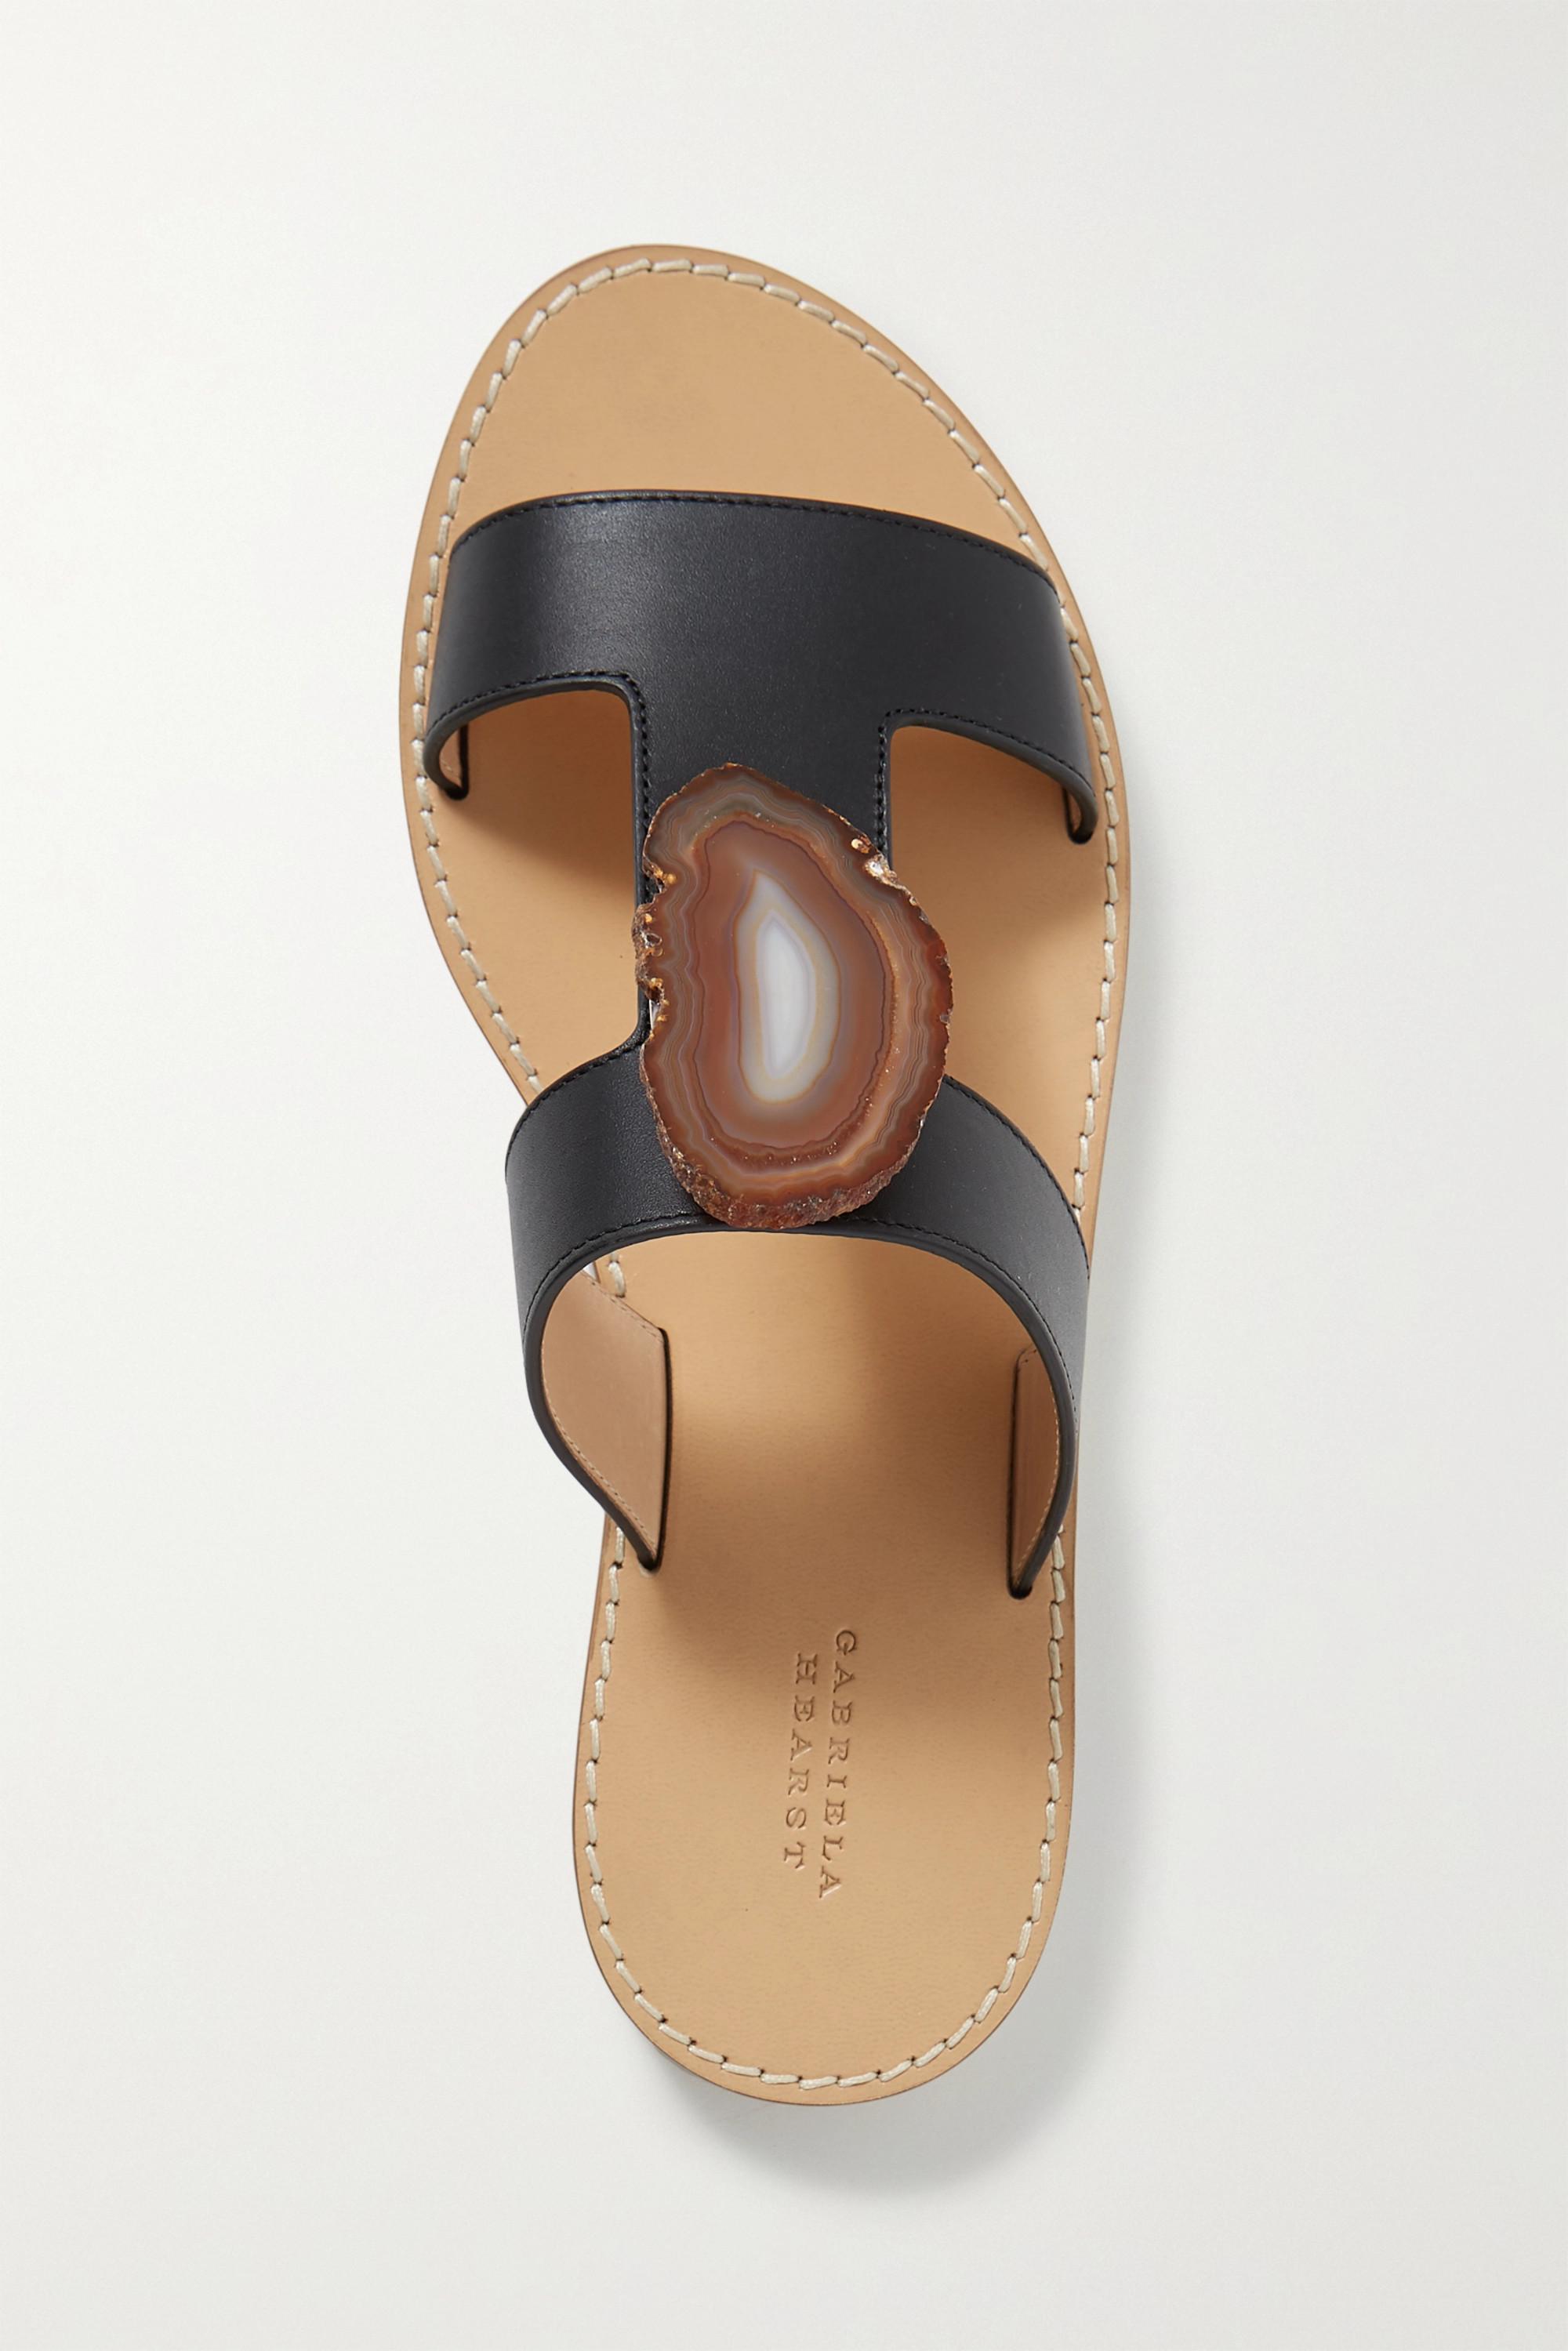 Gabriela Hearst Hades embellished cutout leather sandals